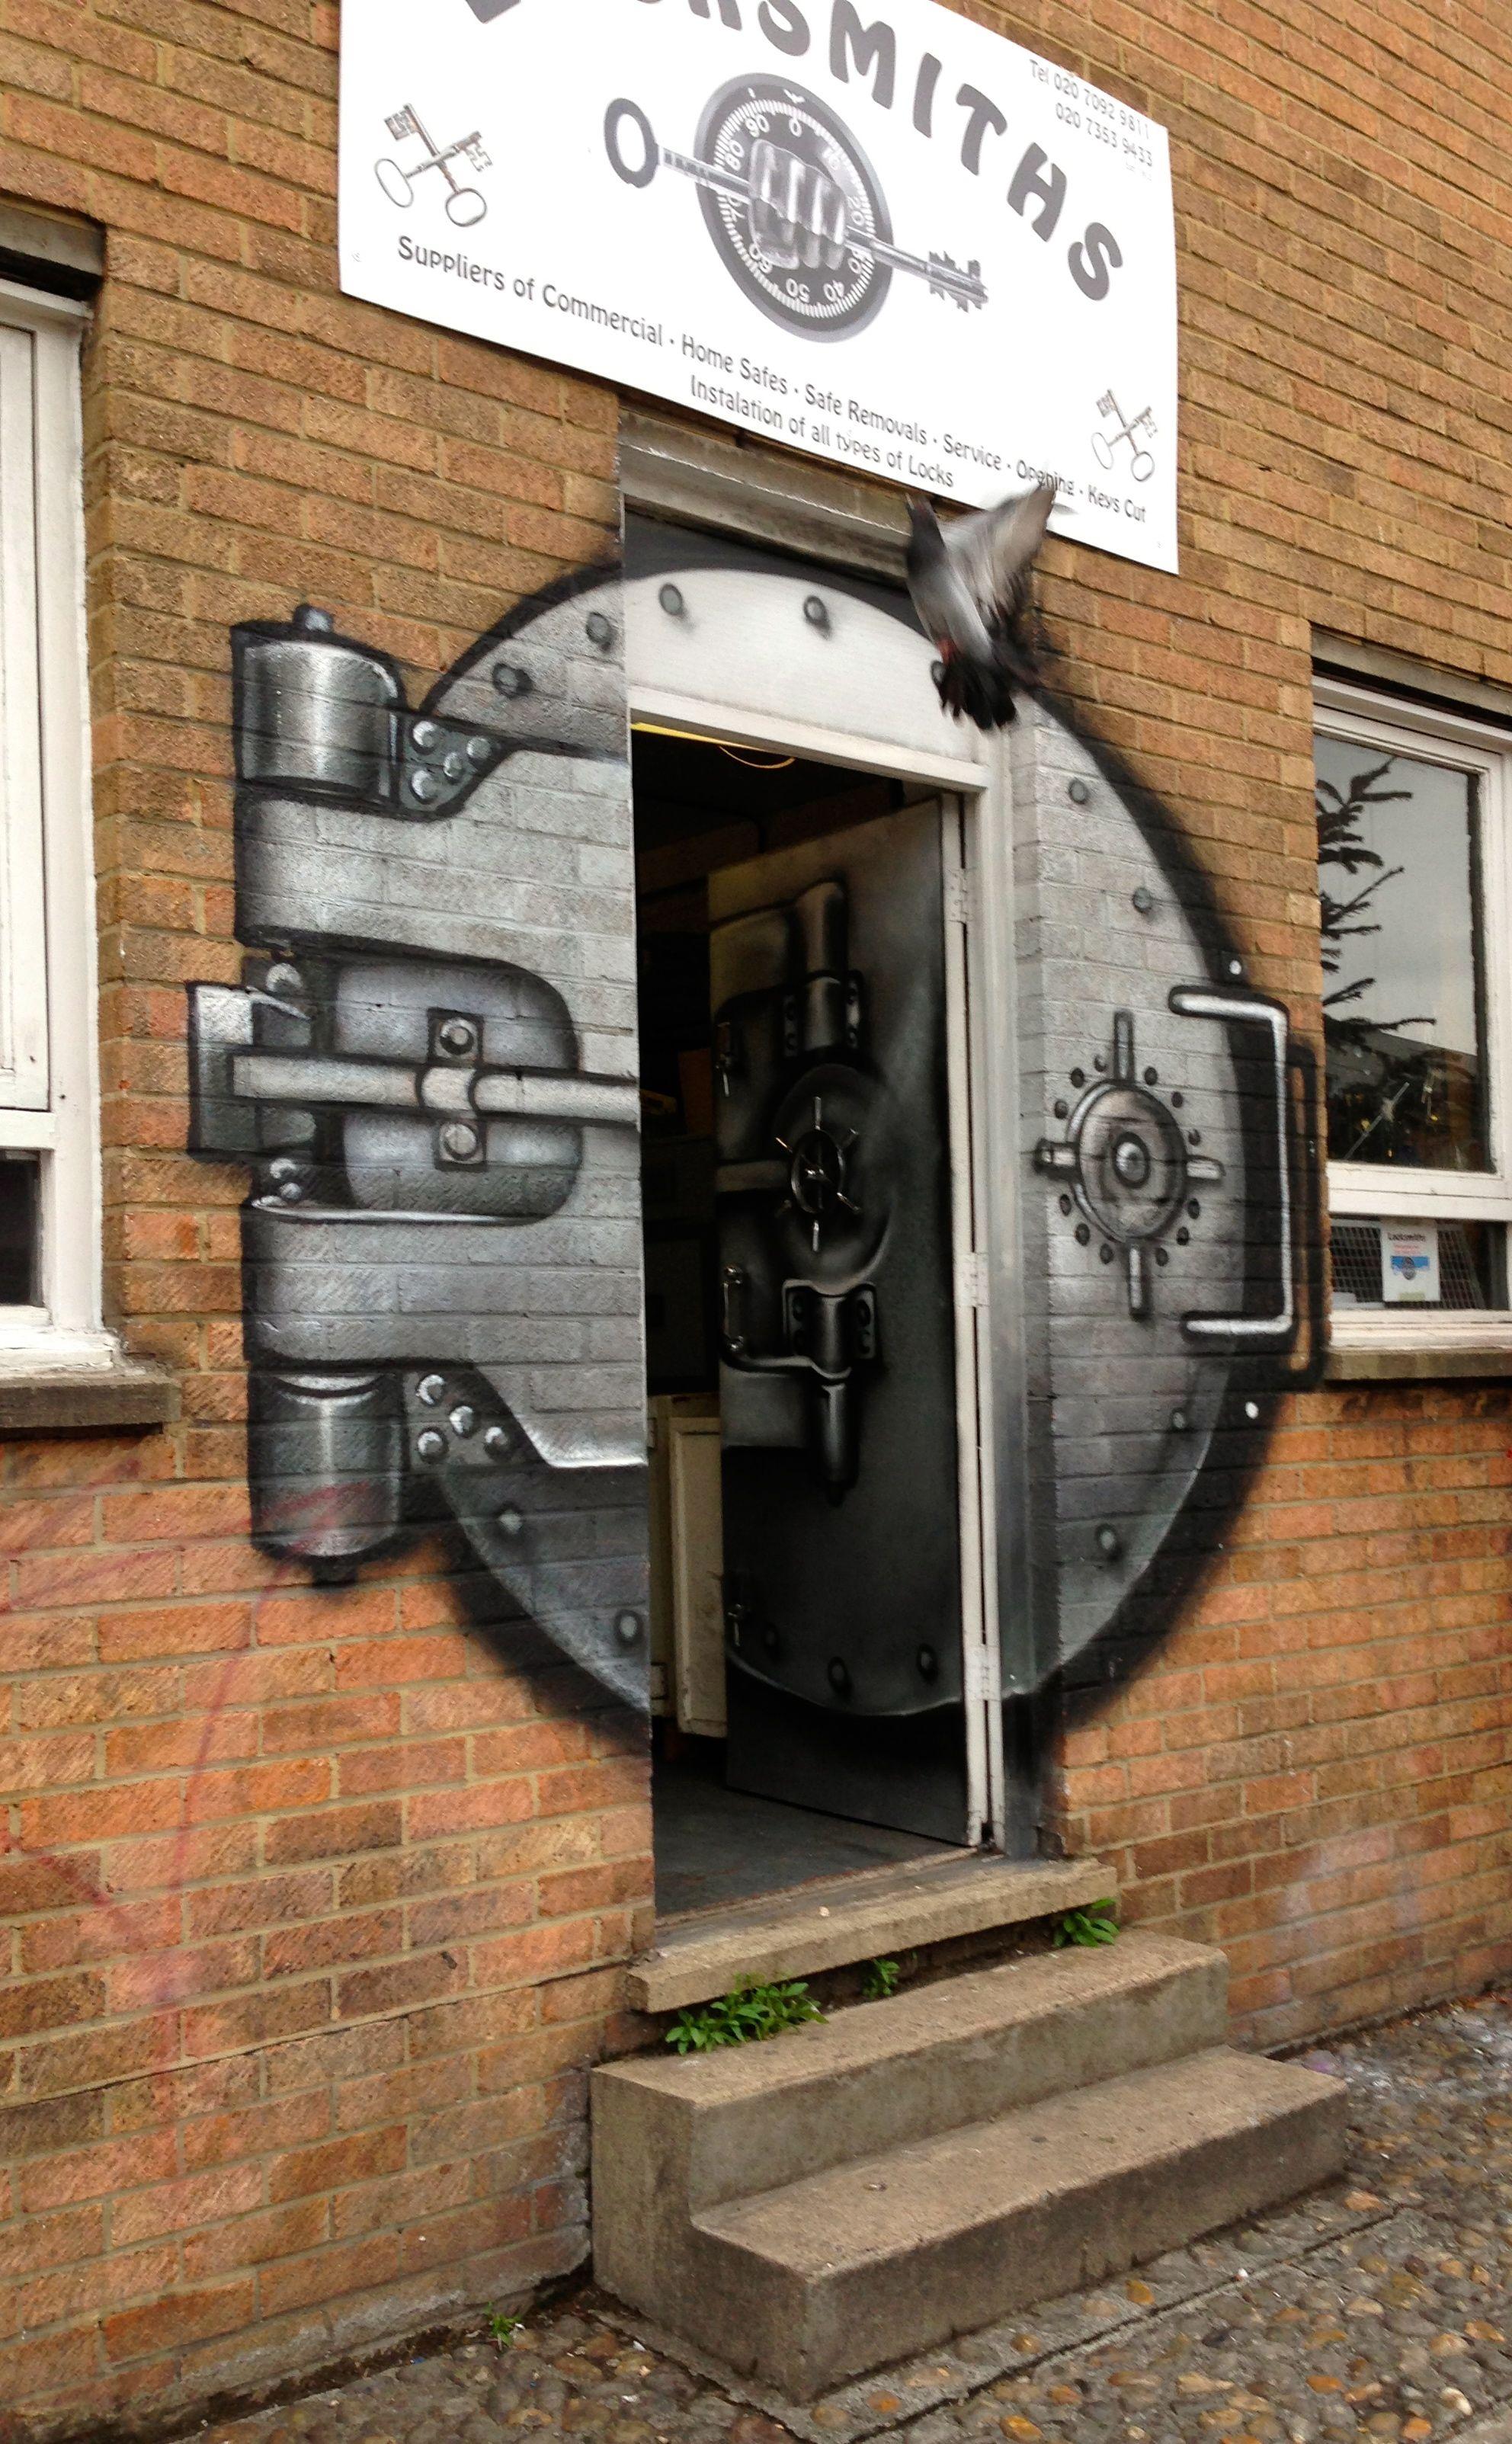 Locksmith storefront mural in in Shoreditch, London | Street art, Mural, Store decor